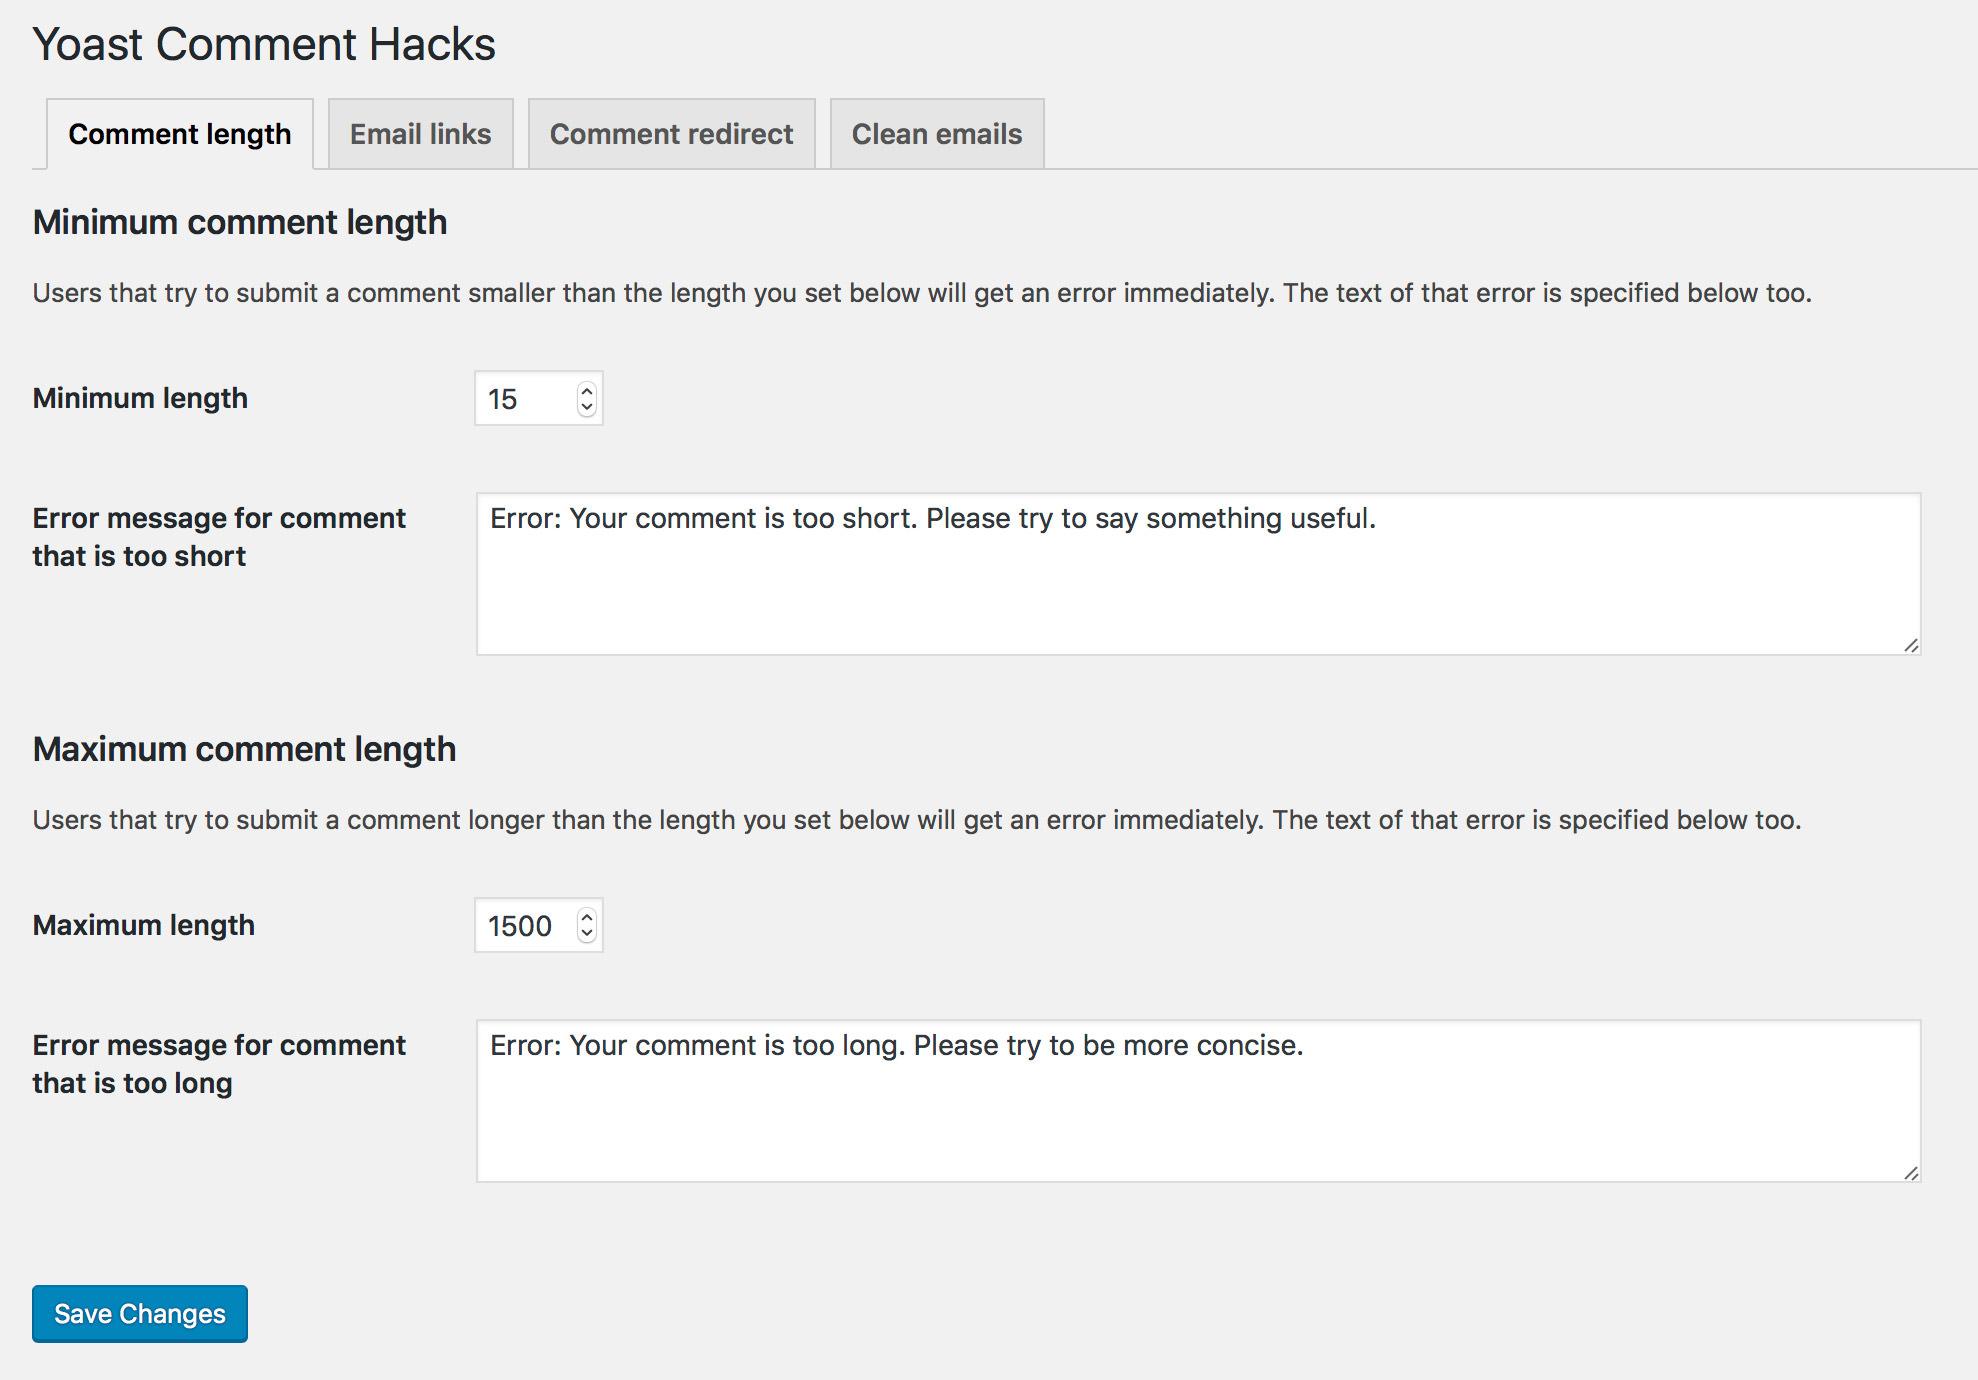 Yoast Comment Hacks